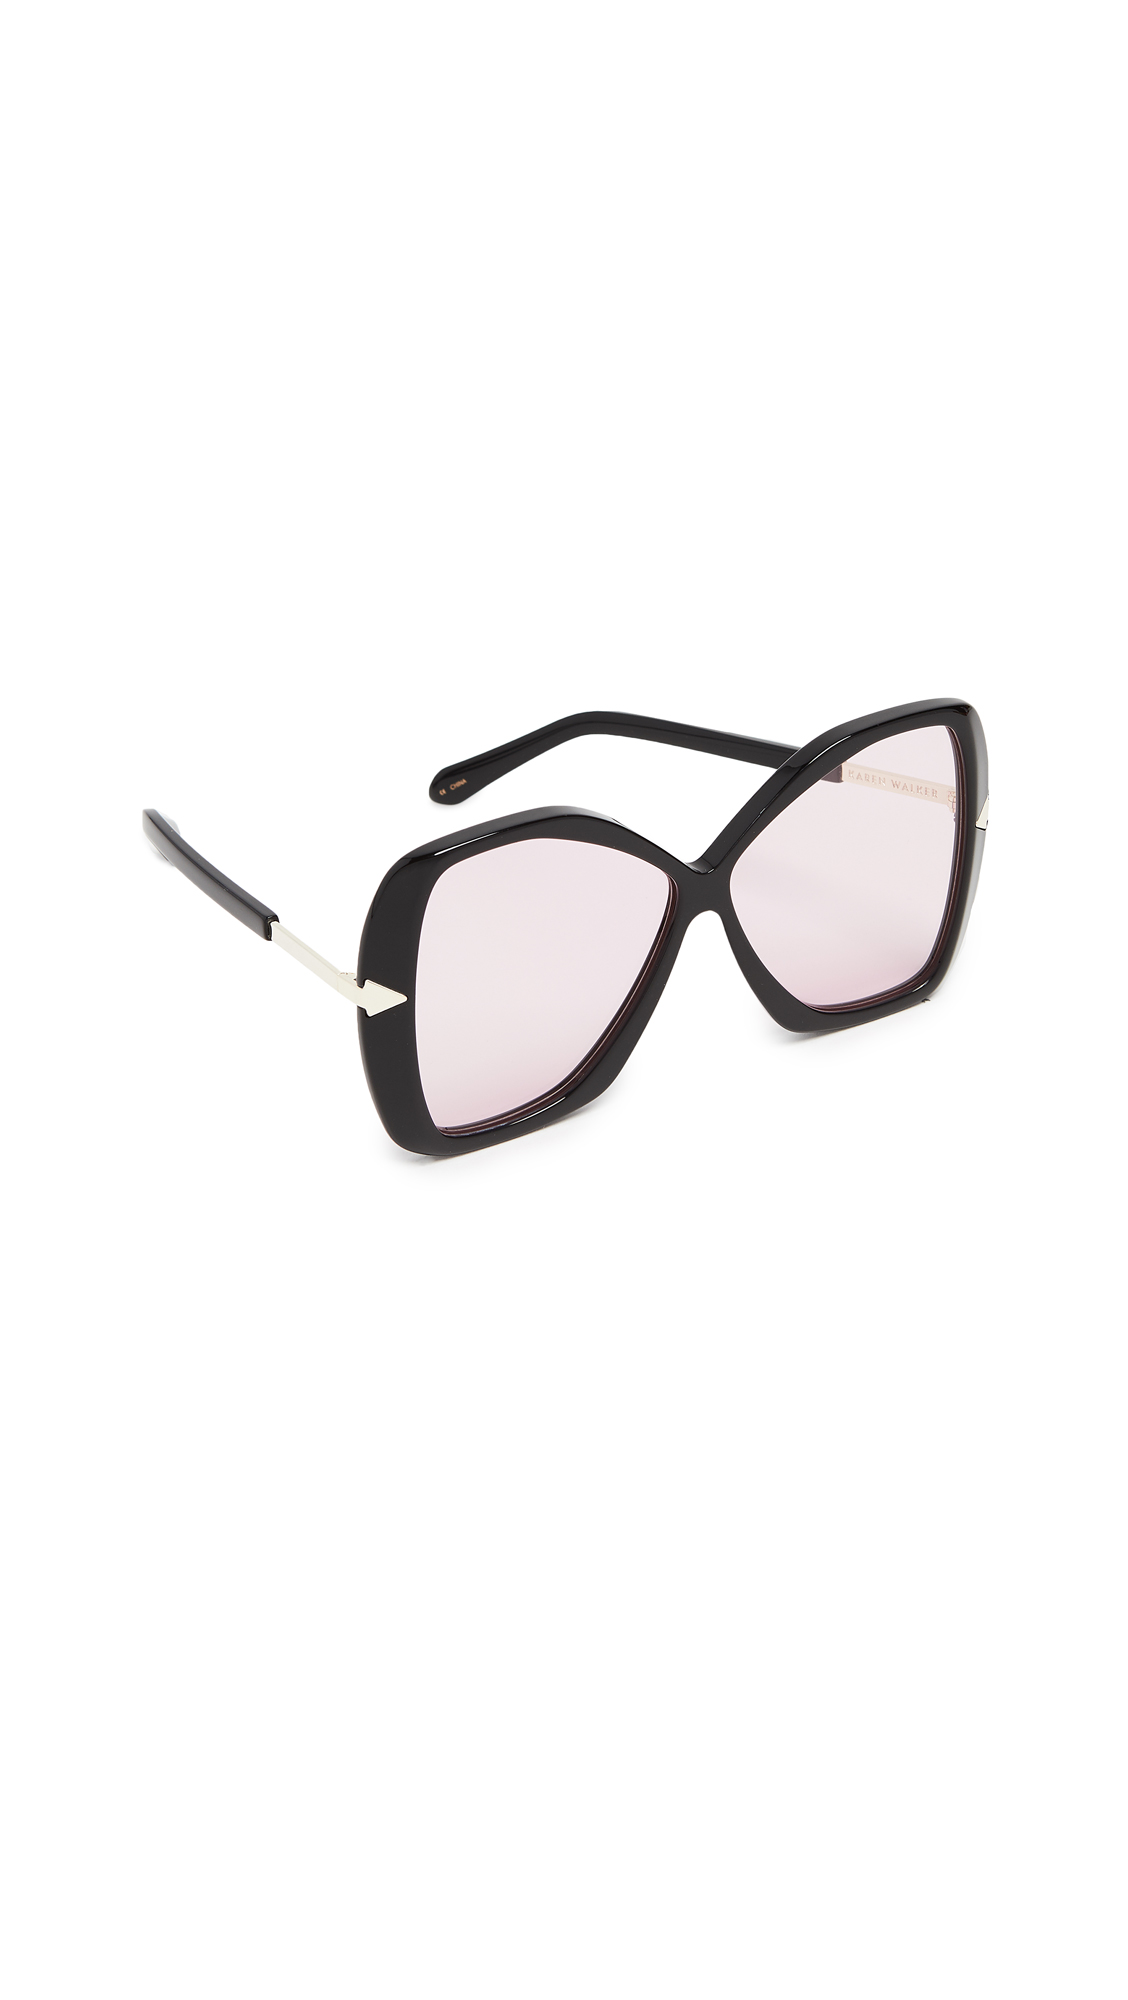 Mary Sunglasses, Black/Pink Tint